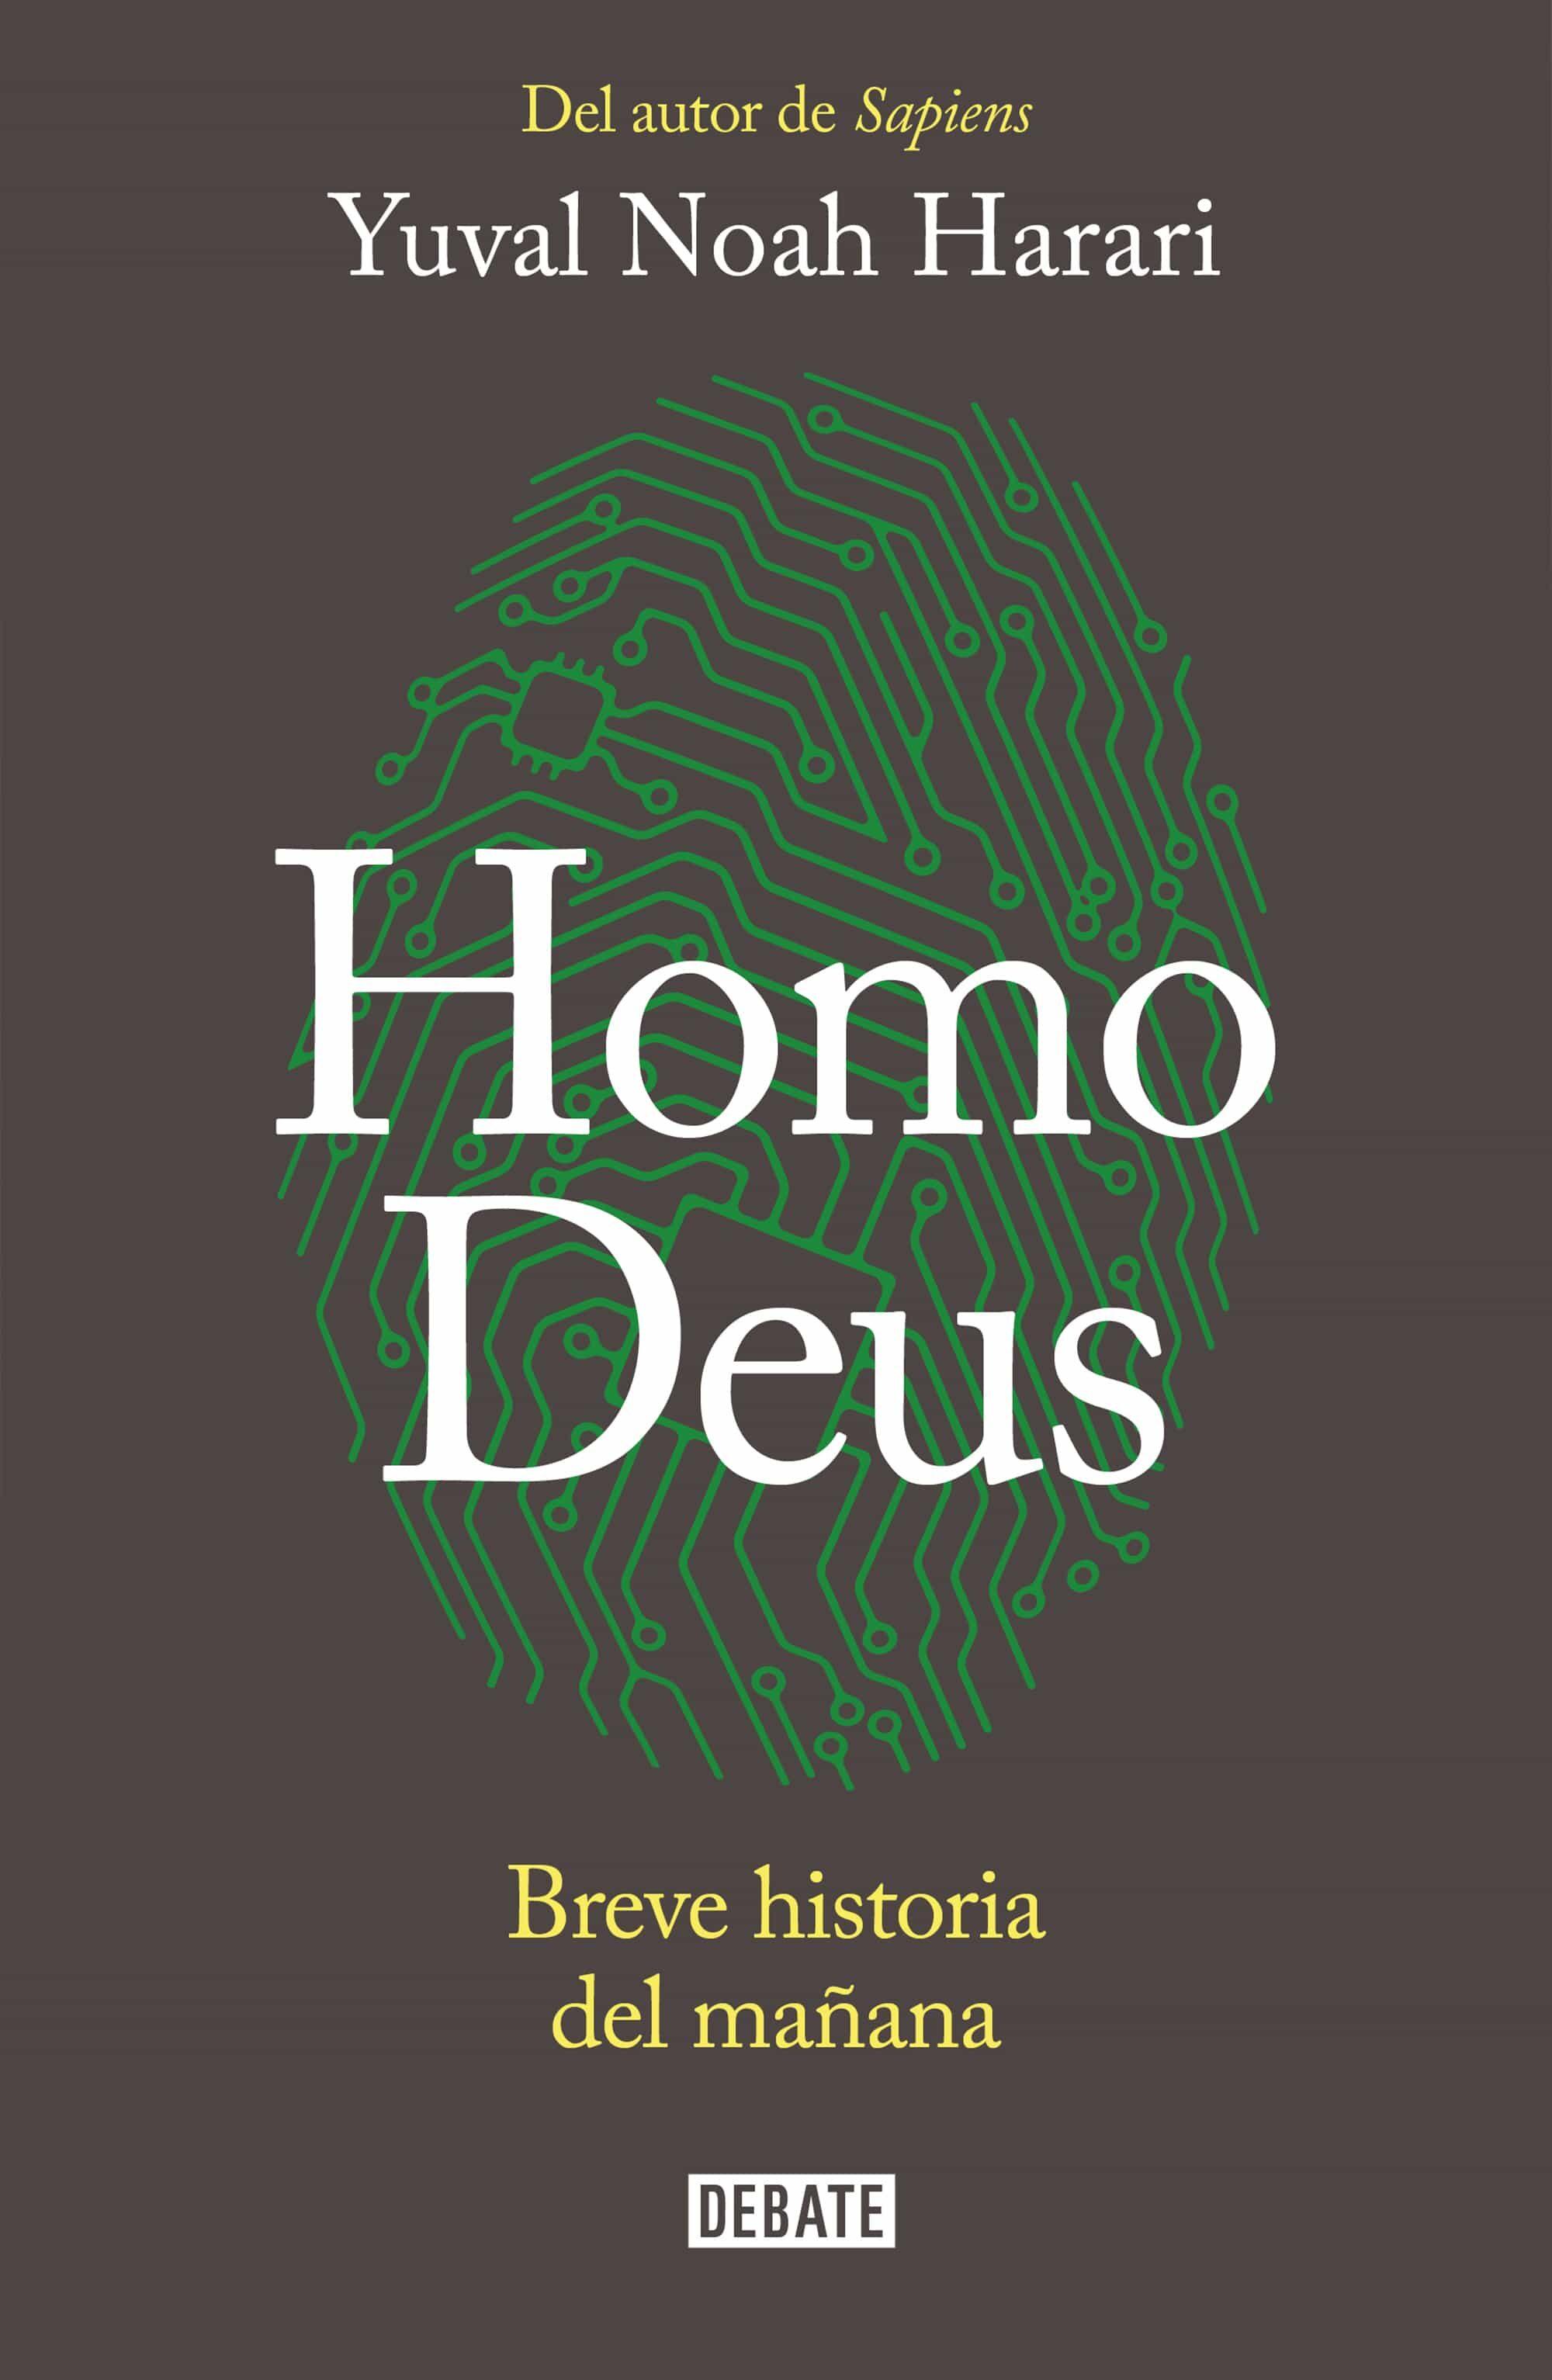 YUVAL NOAH HARARI (2016): HOMO DEUS: BREVE HISTORIA DEL MAÑANA.